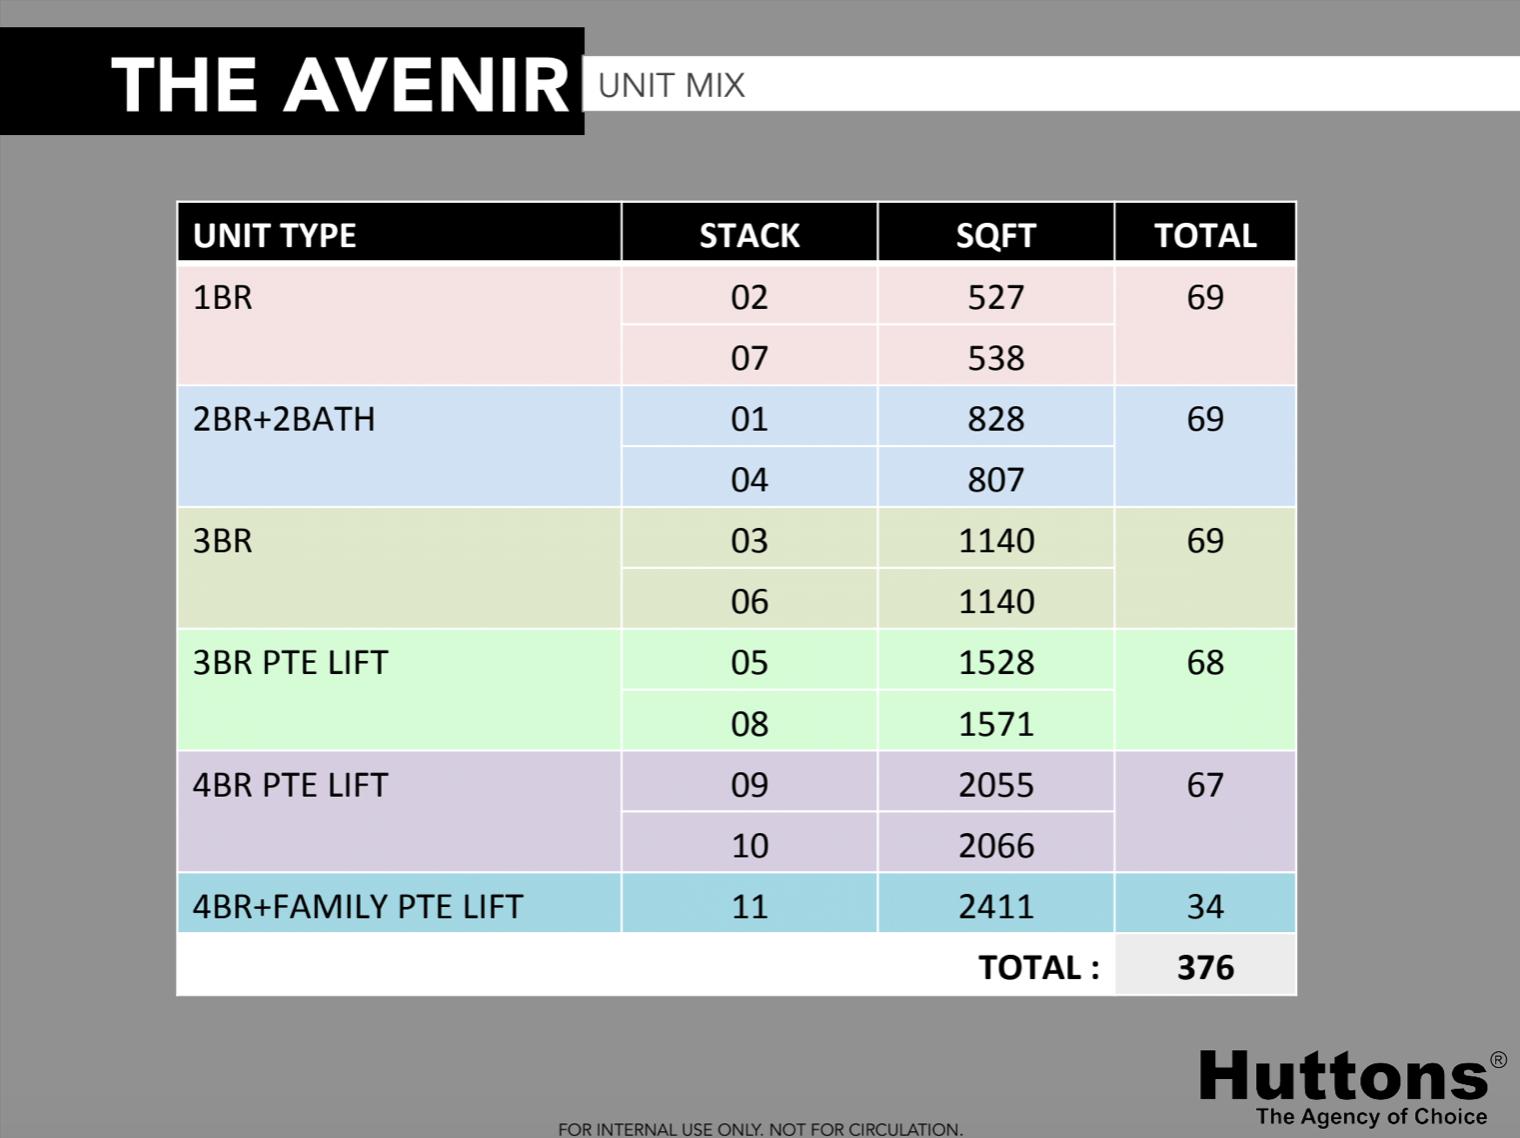 the avenir unit mix